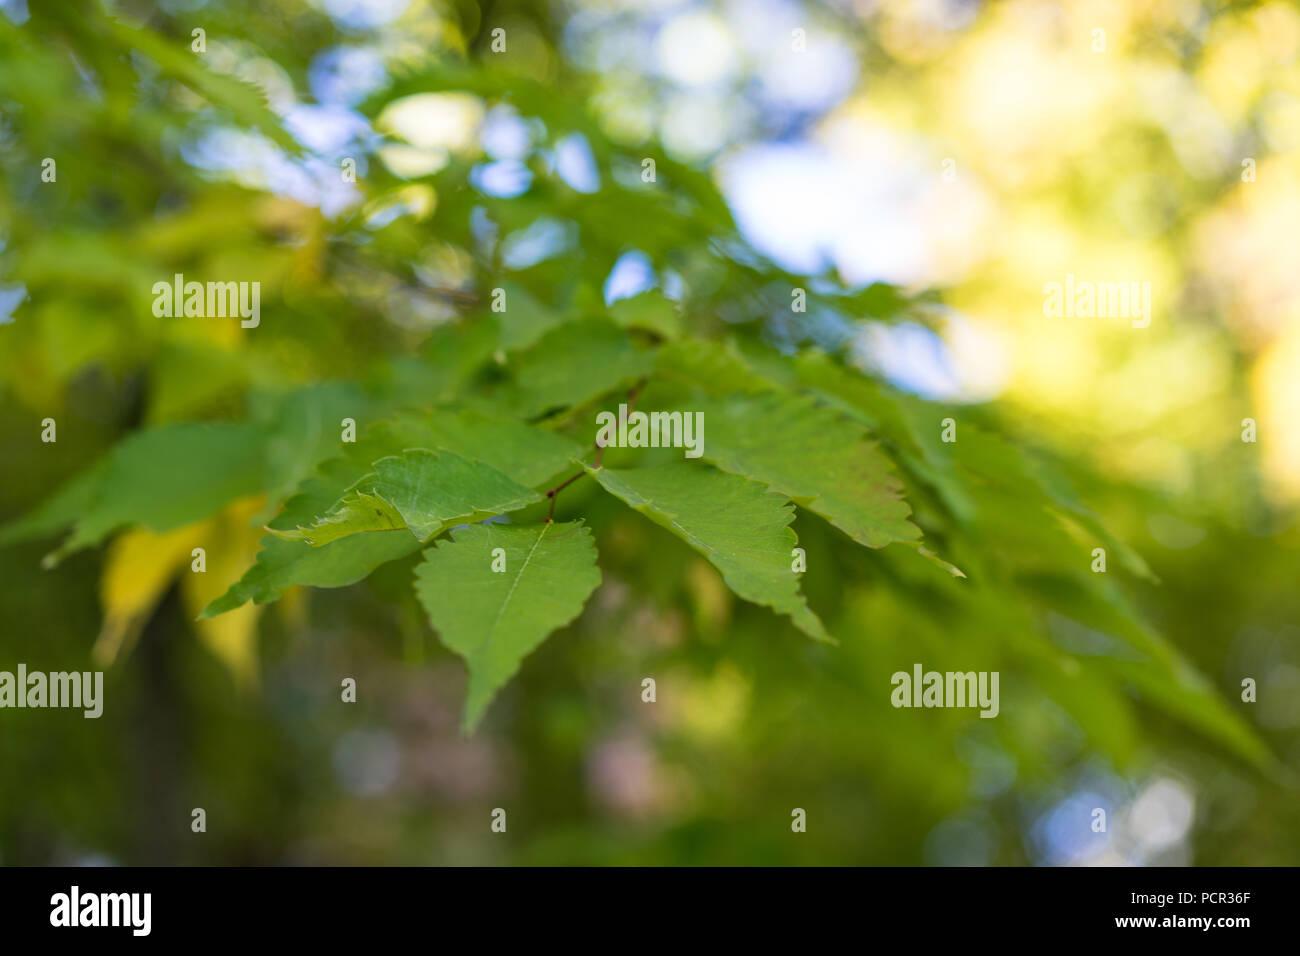 leaves of japanese zelkova serrata close up - Stock Image